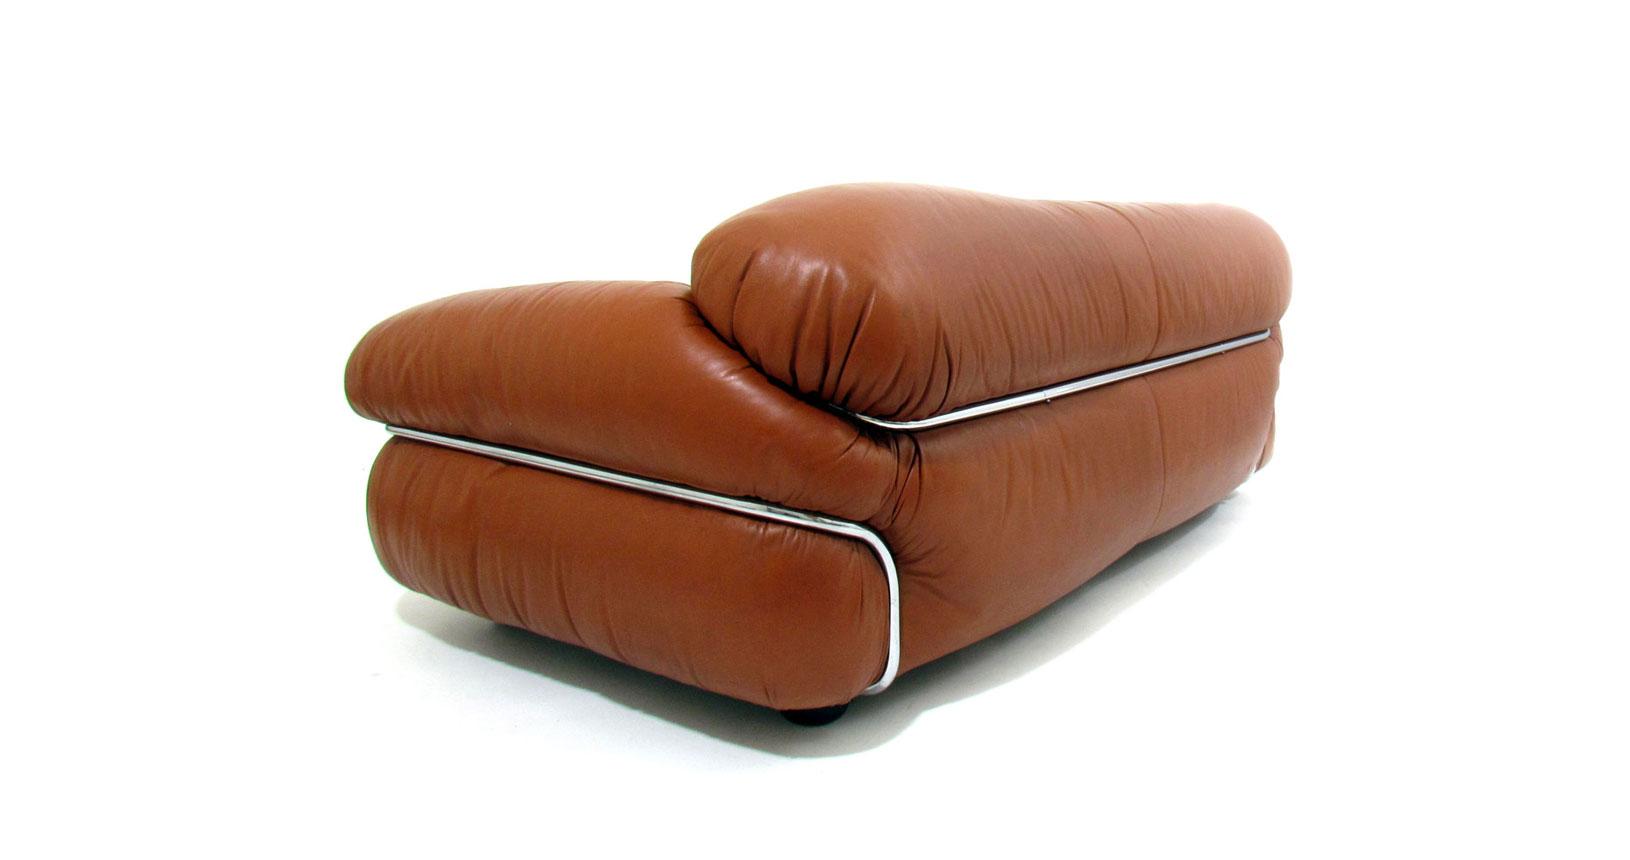 sesann 595 sofa leather cassina gianfranco frattini pelle